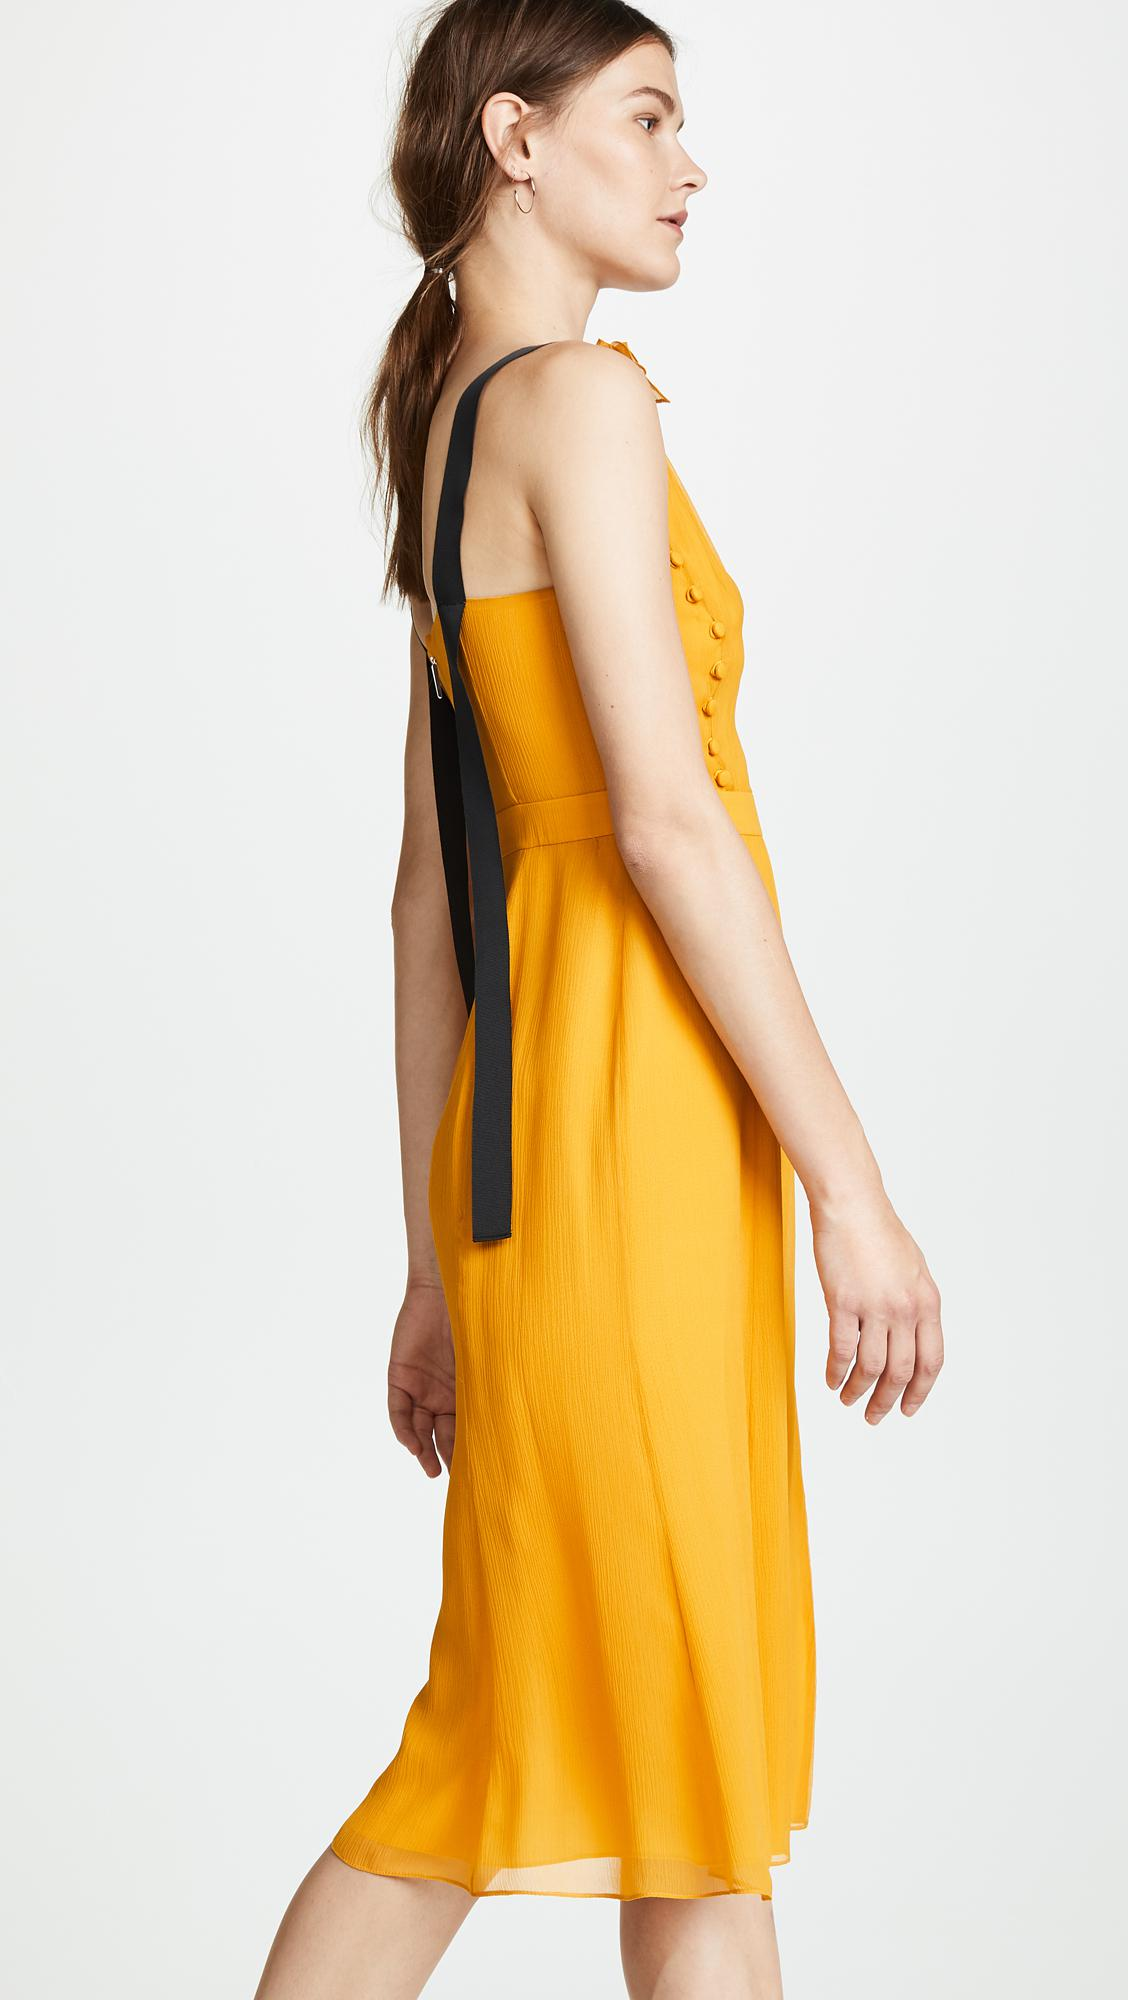 Lyst - Prabal Gurung Deep V Silk Dress With Button Detail in Yellow 53bbf4886